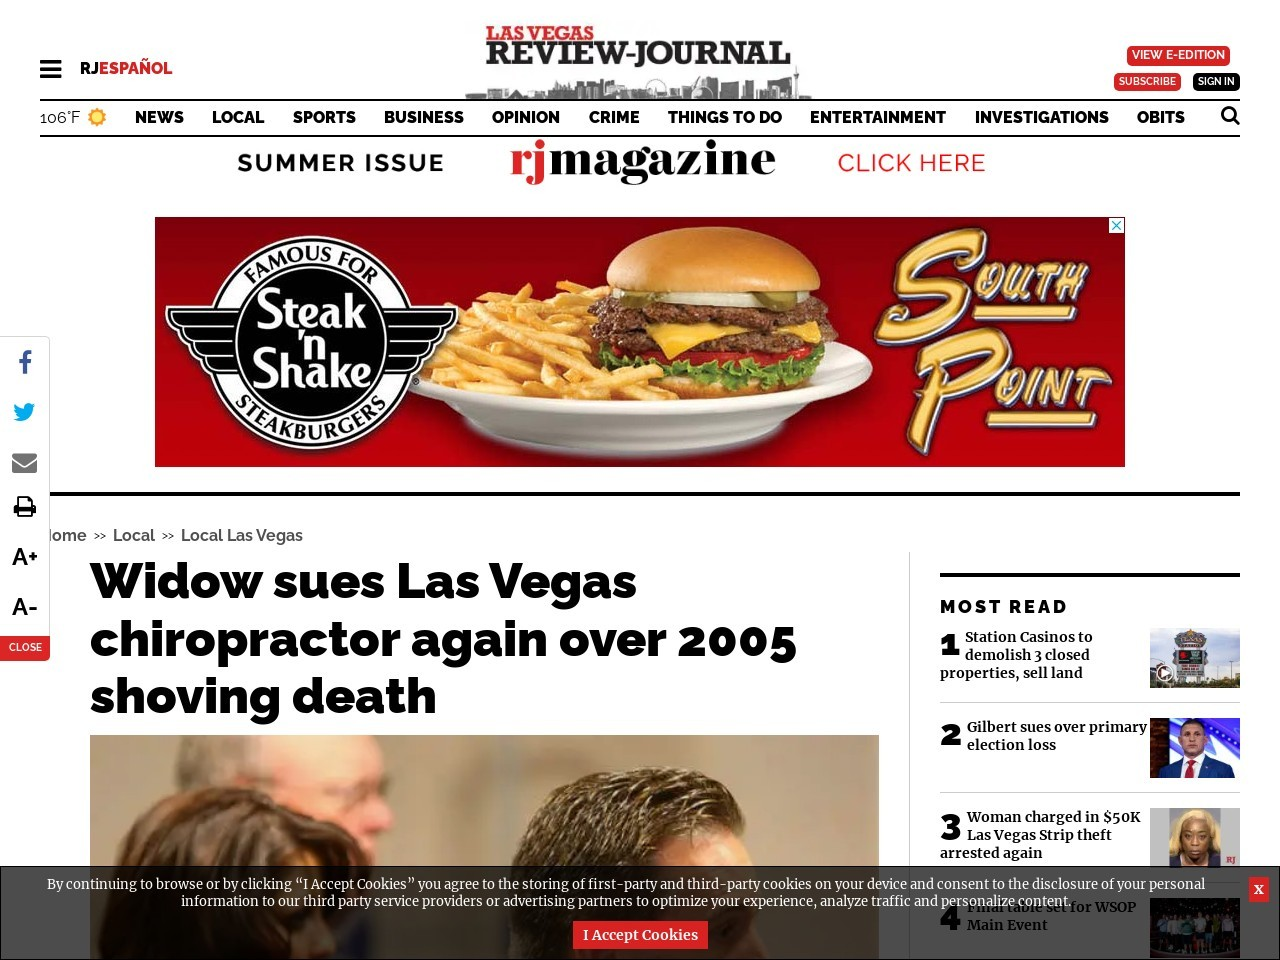 Widow sues Las Vegas chiropractor again over 2005 shoving death